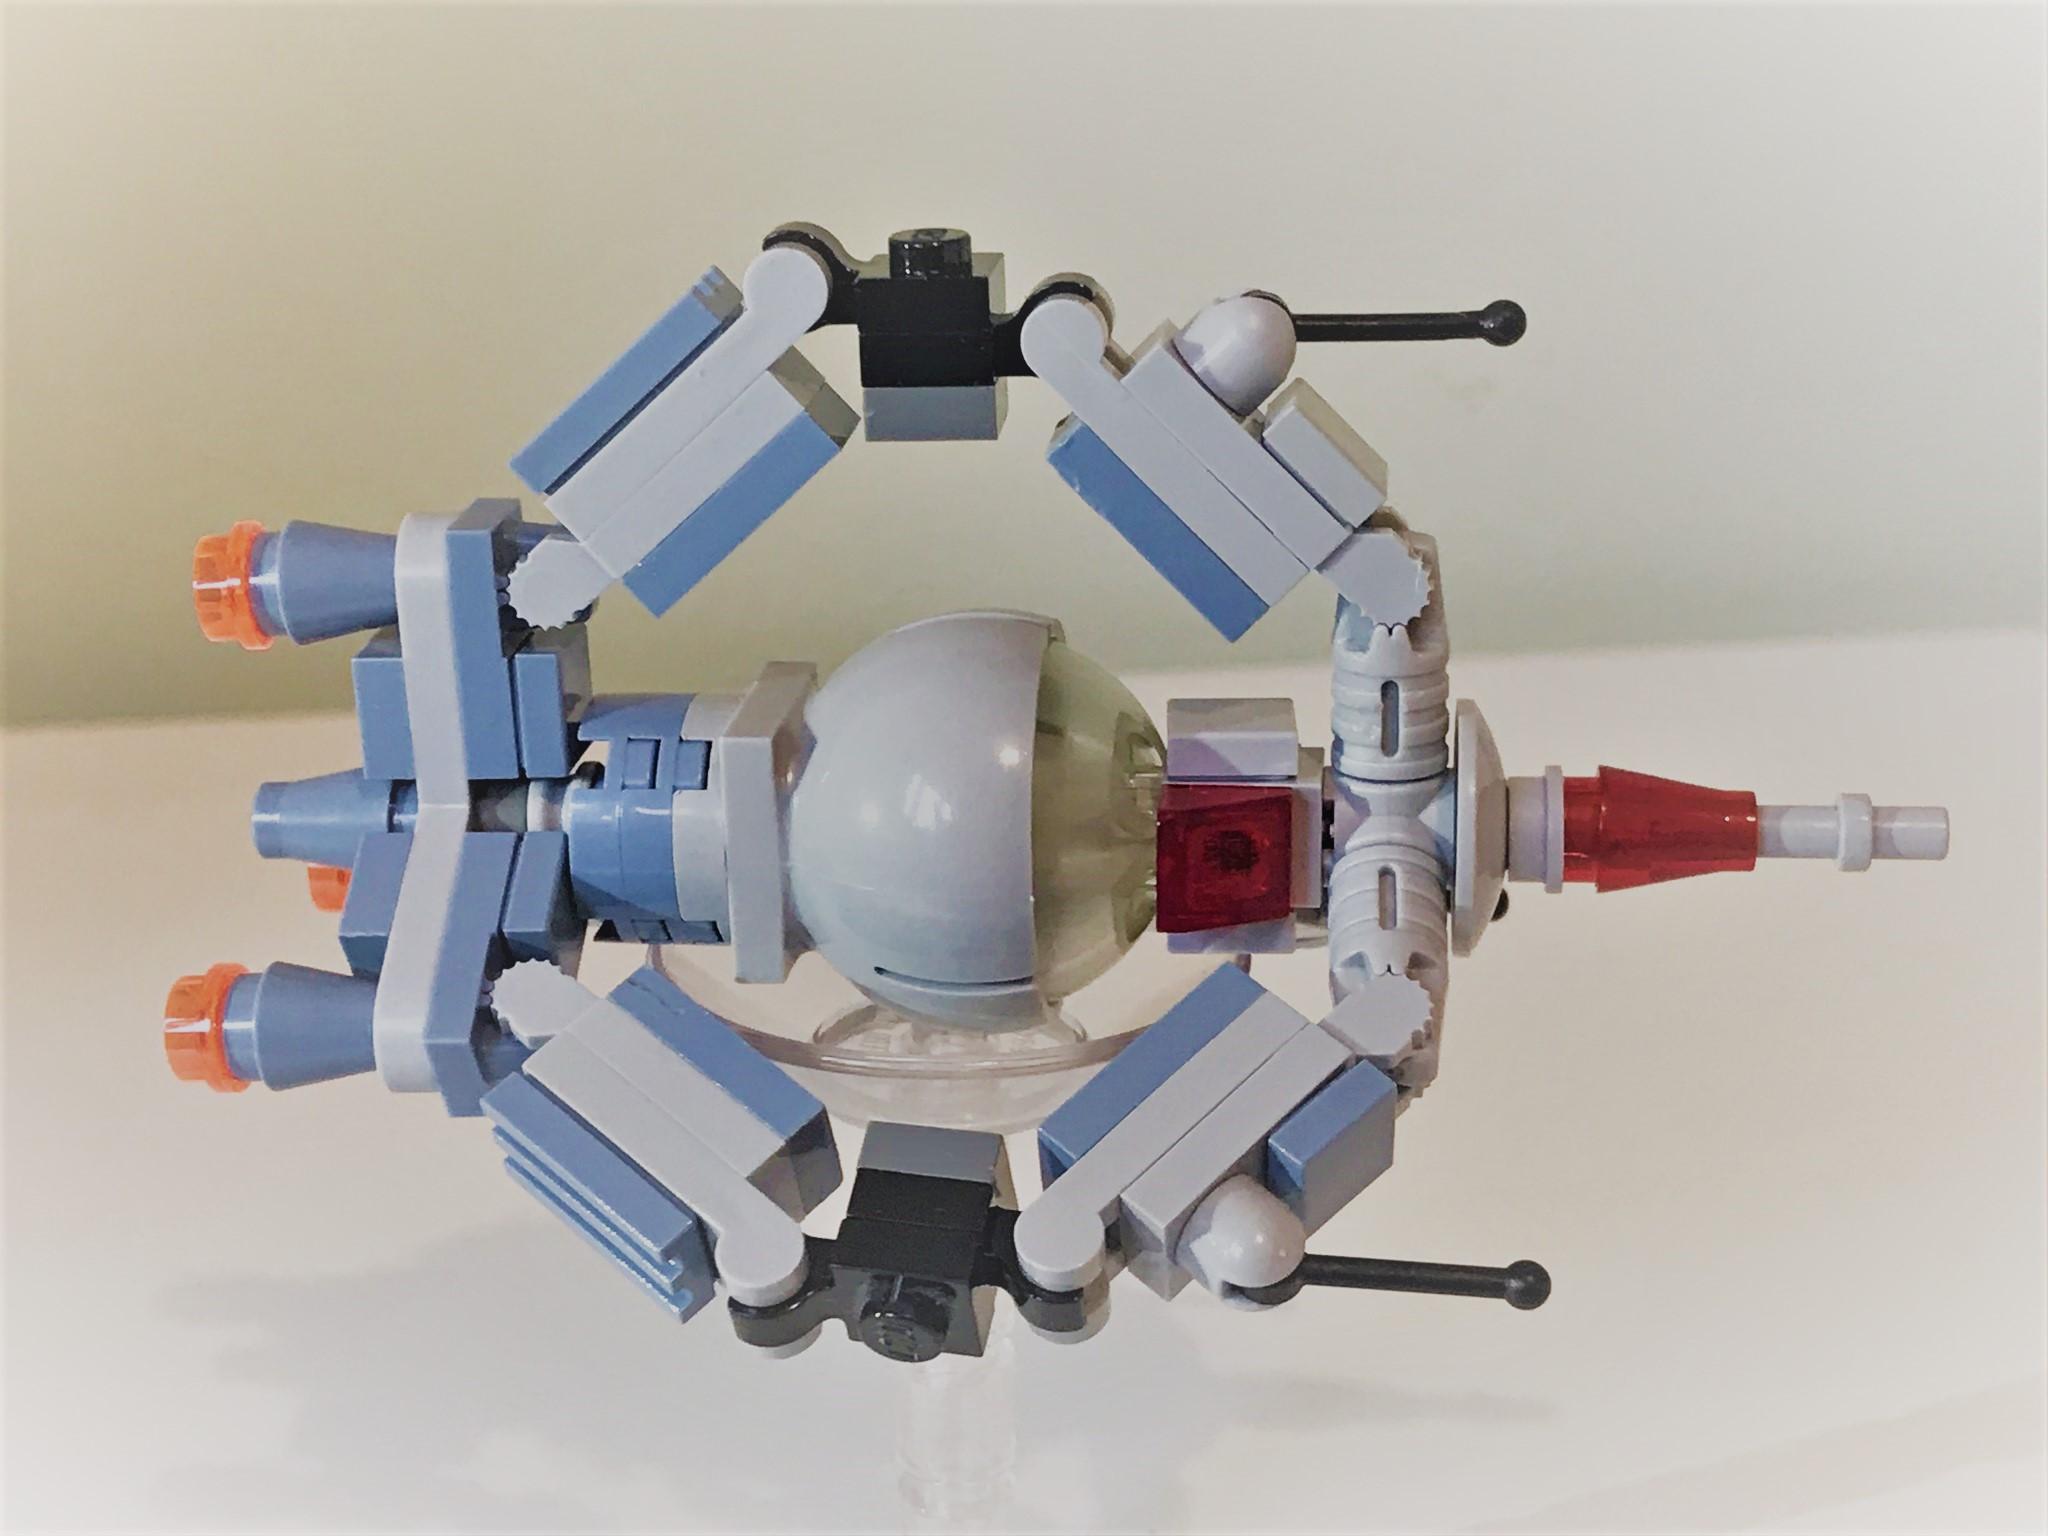 Droidtrifighter3.JPEG